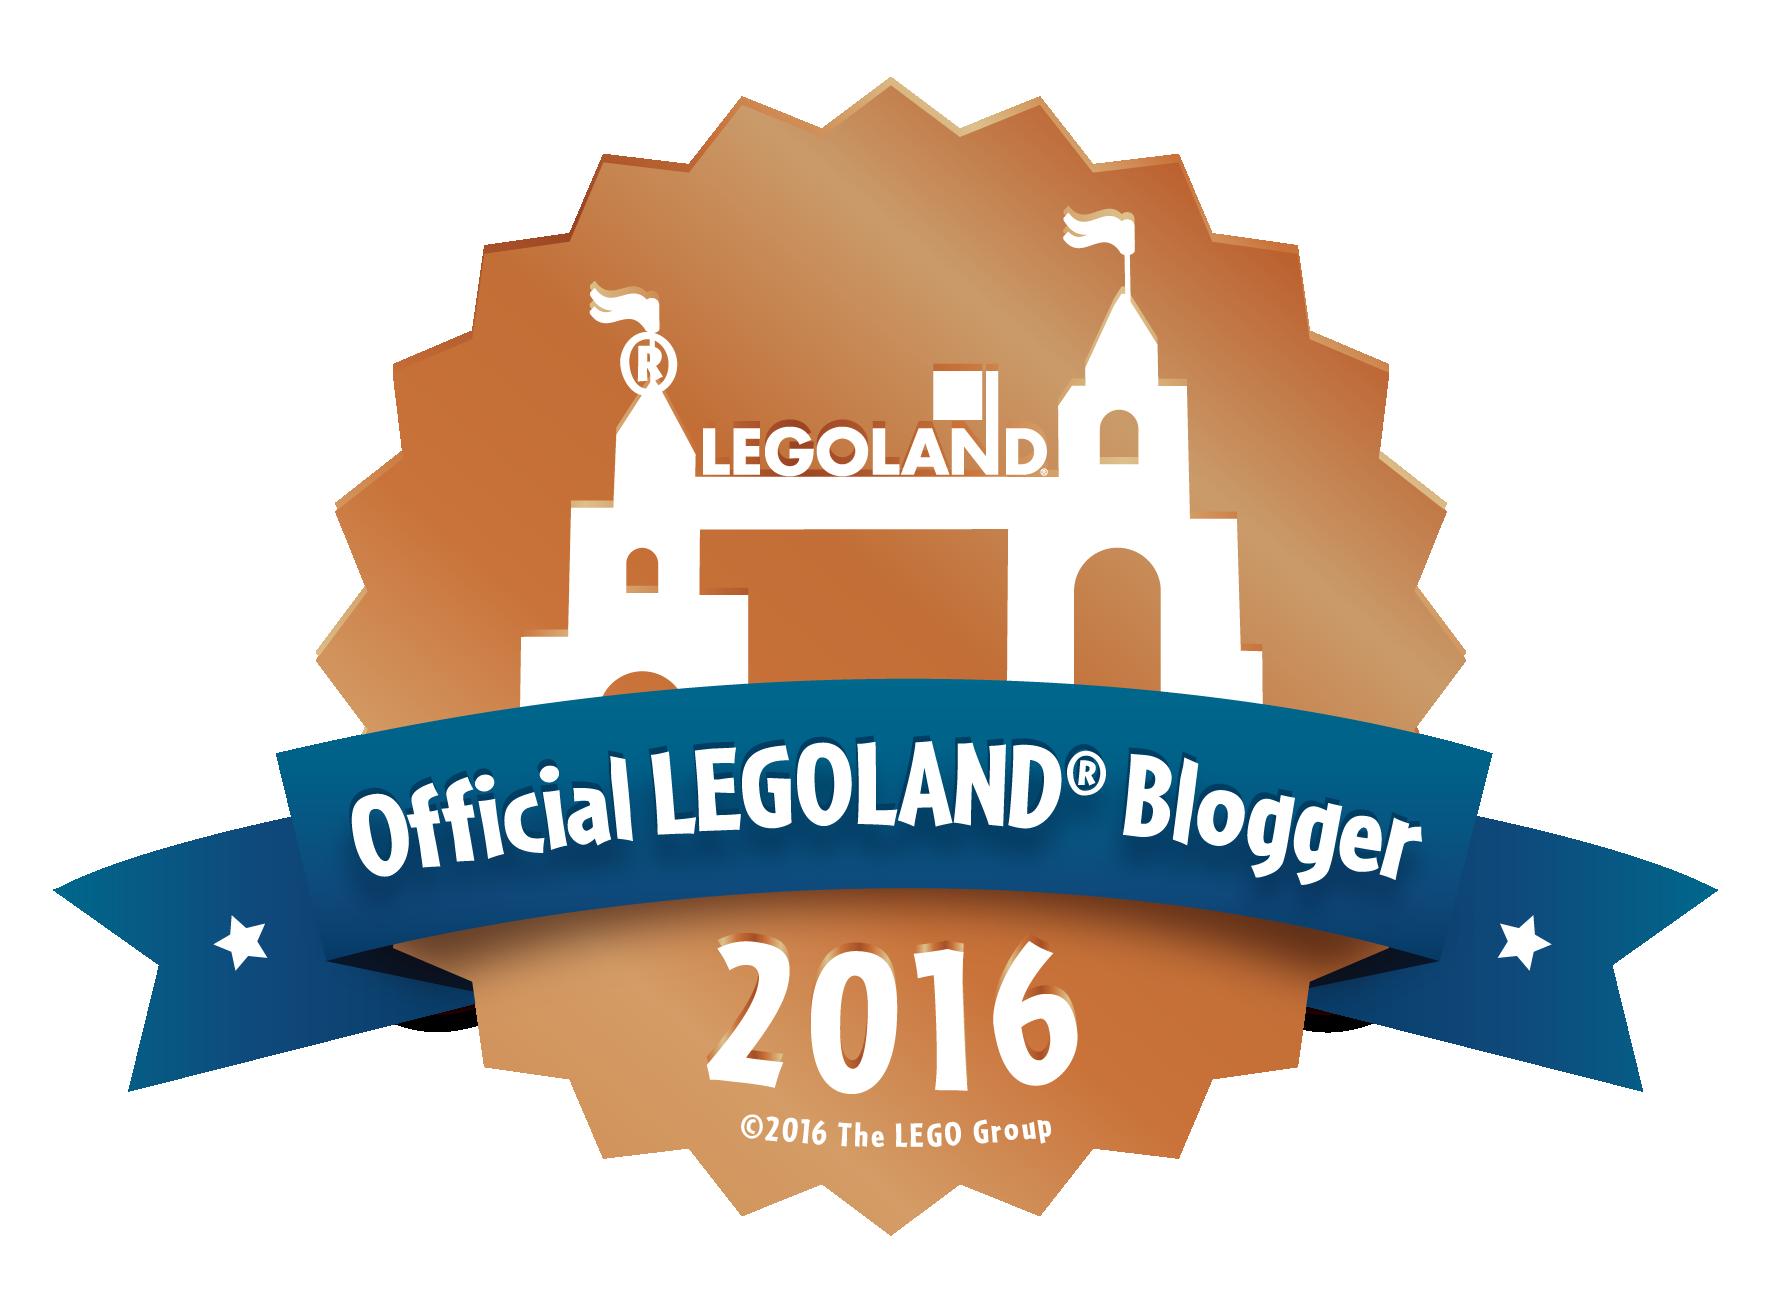 Legoland Blogger 2016